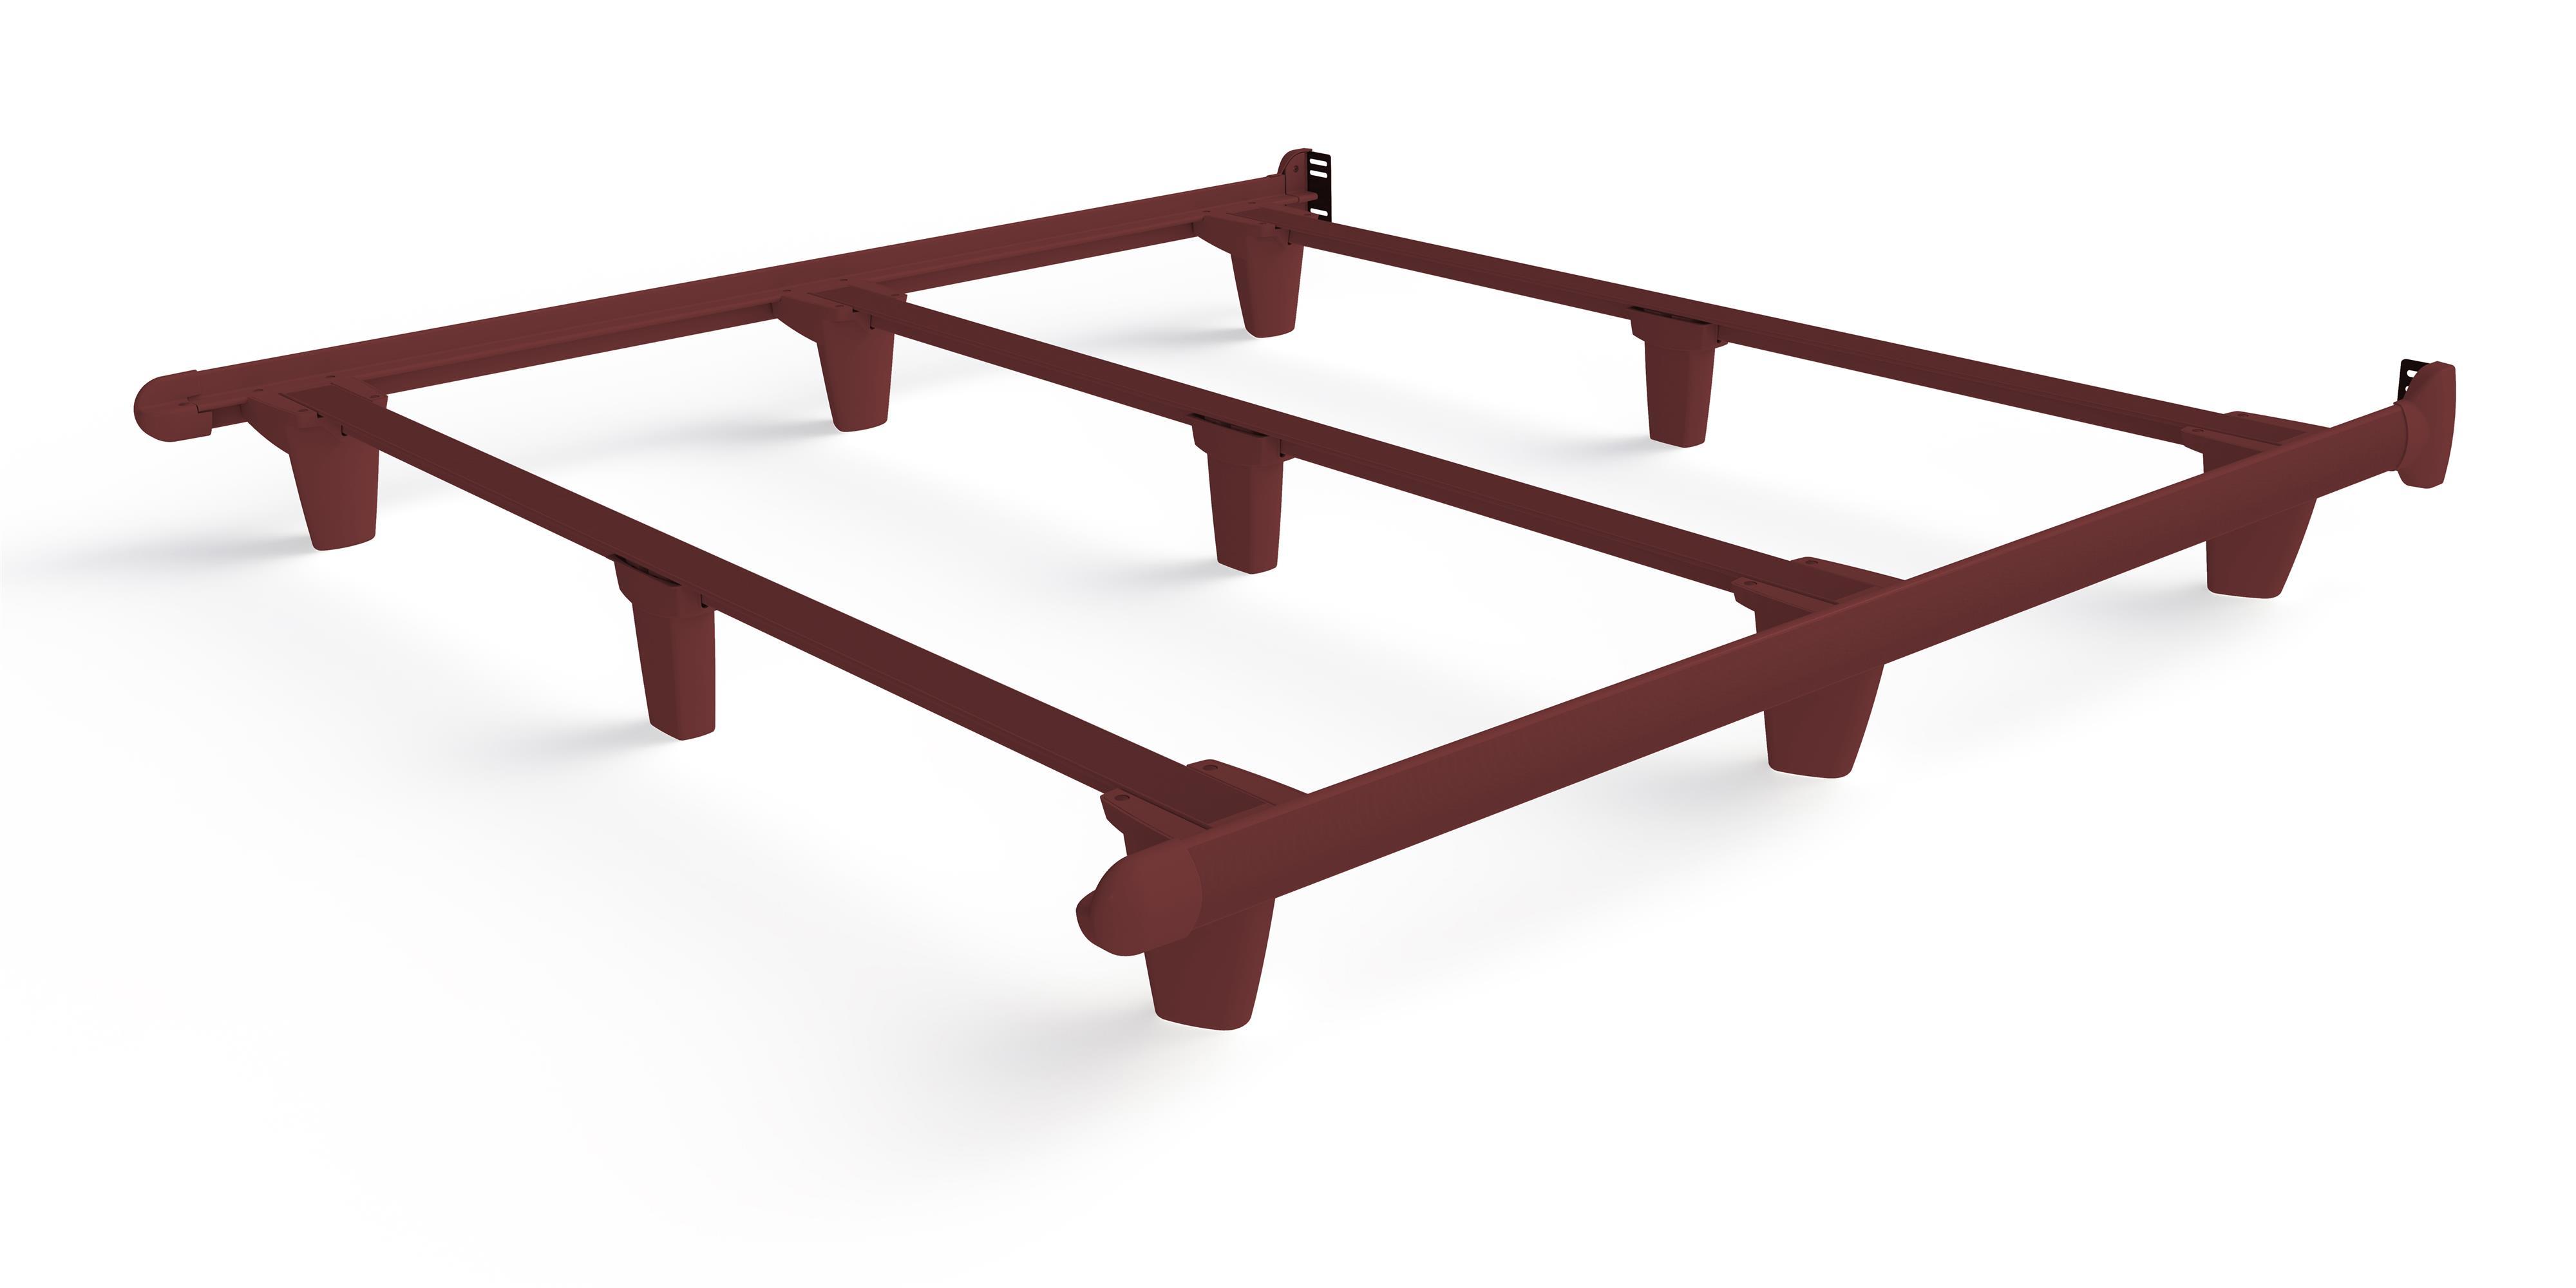 emBrace emBrace Eastern King Bed Frame - Red by Knickerbocker at SlumberWorld